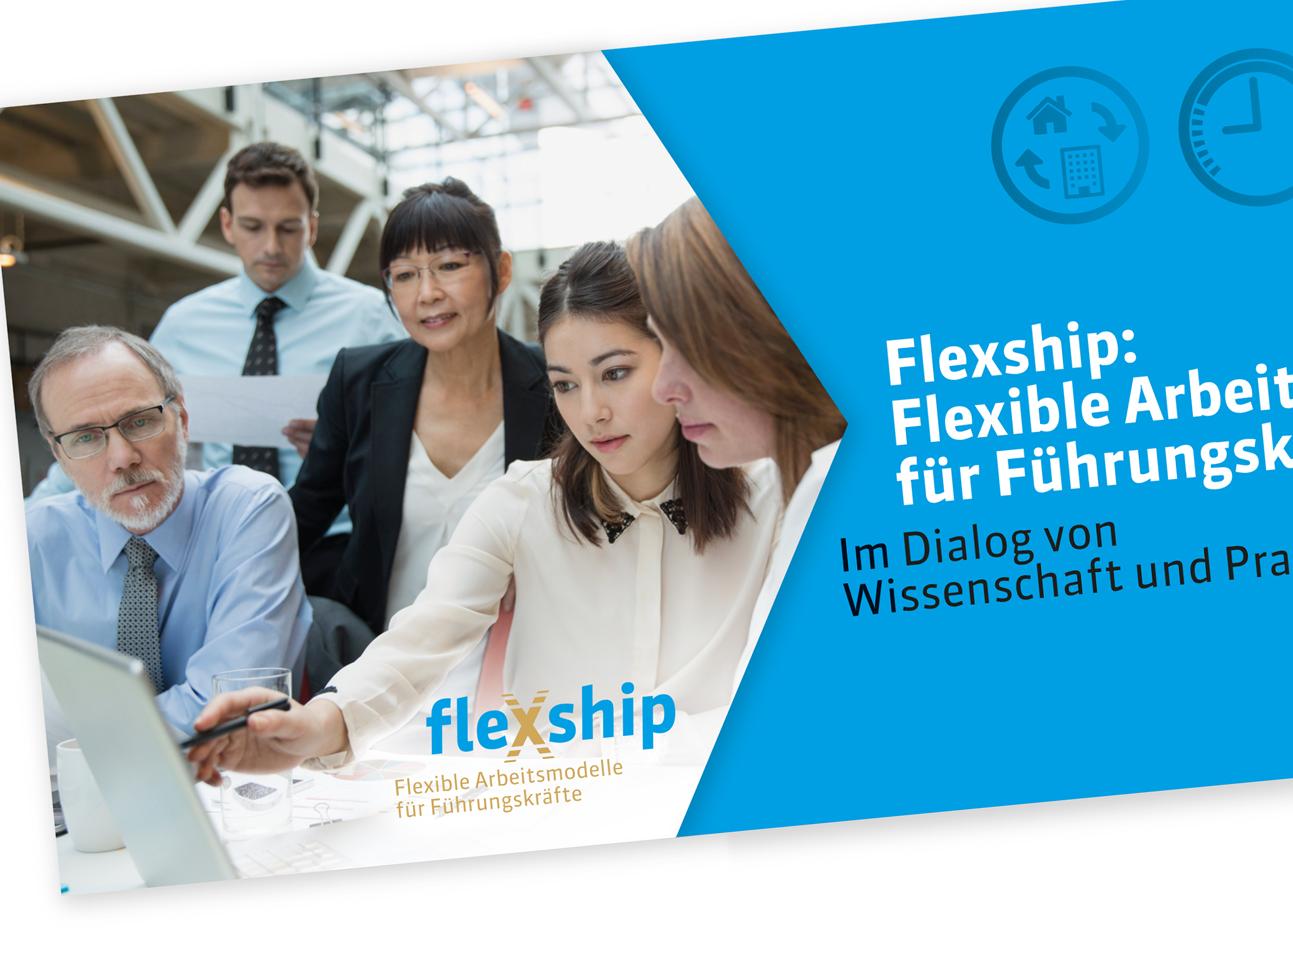 martin_zech_design_projekt_design_flexship_flyer_cover